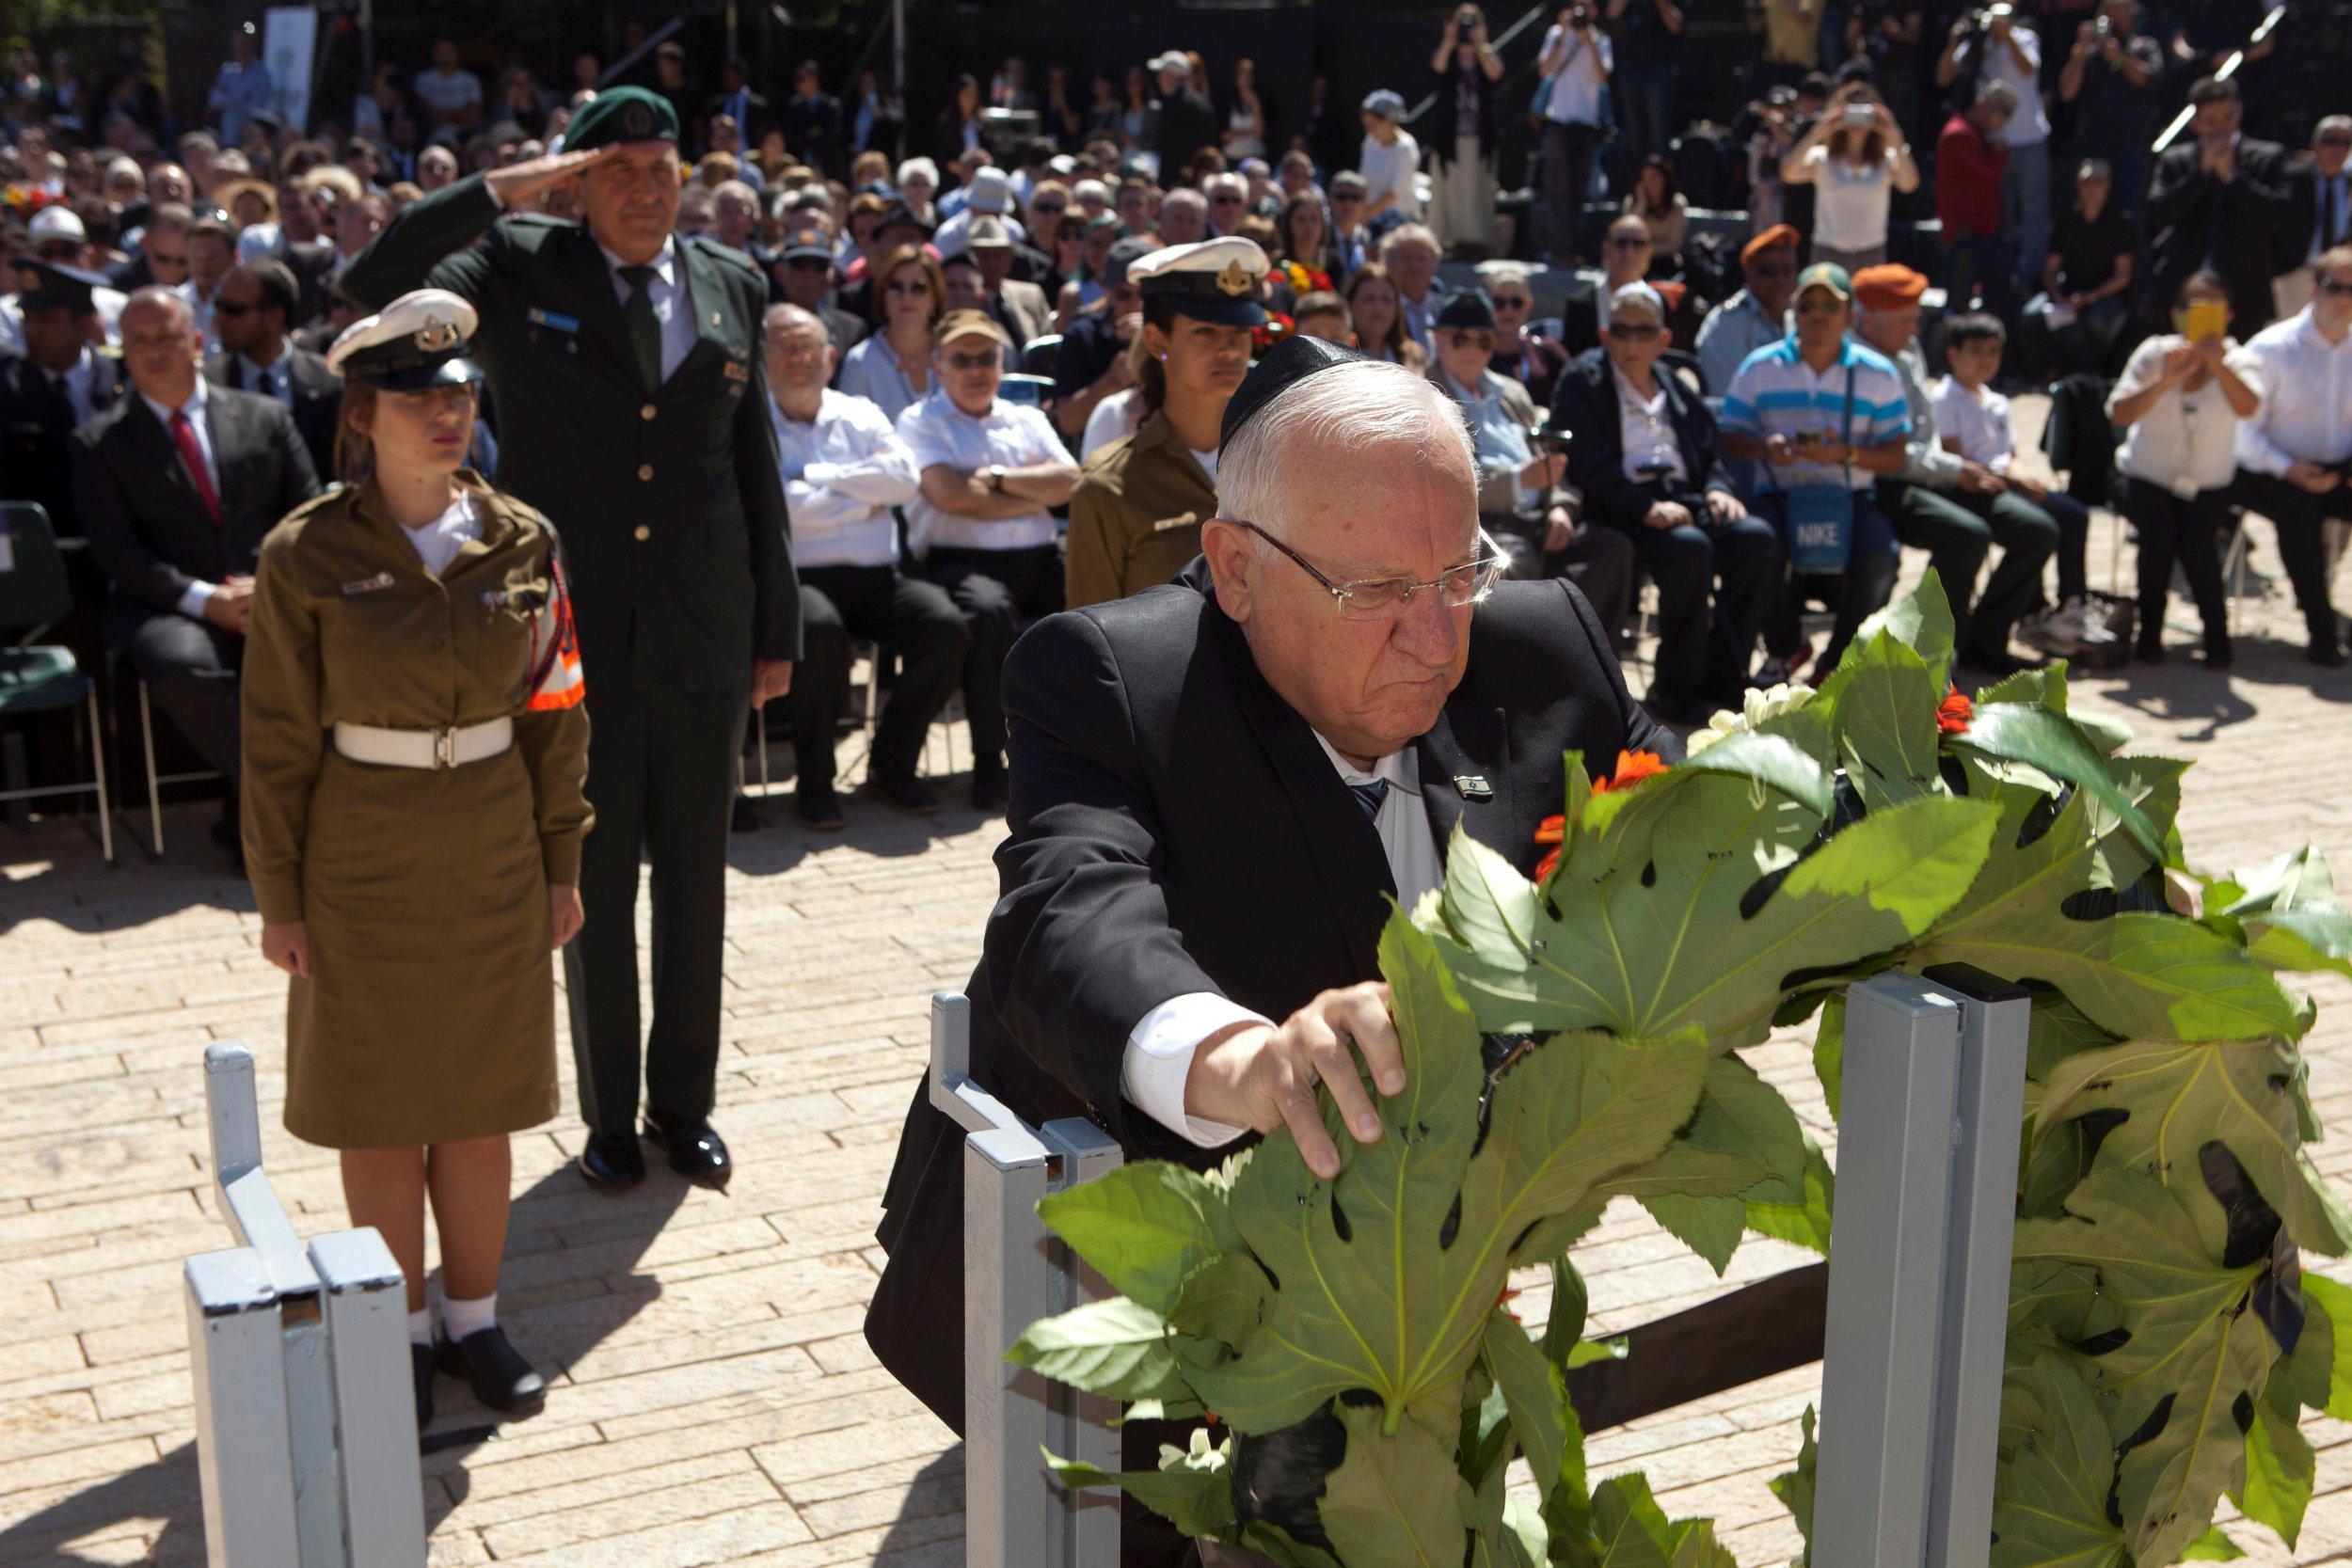 Israel Austria Anti-Semite Semitism